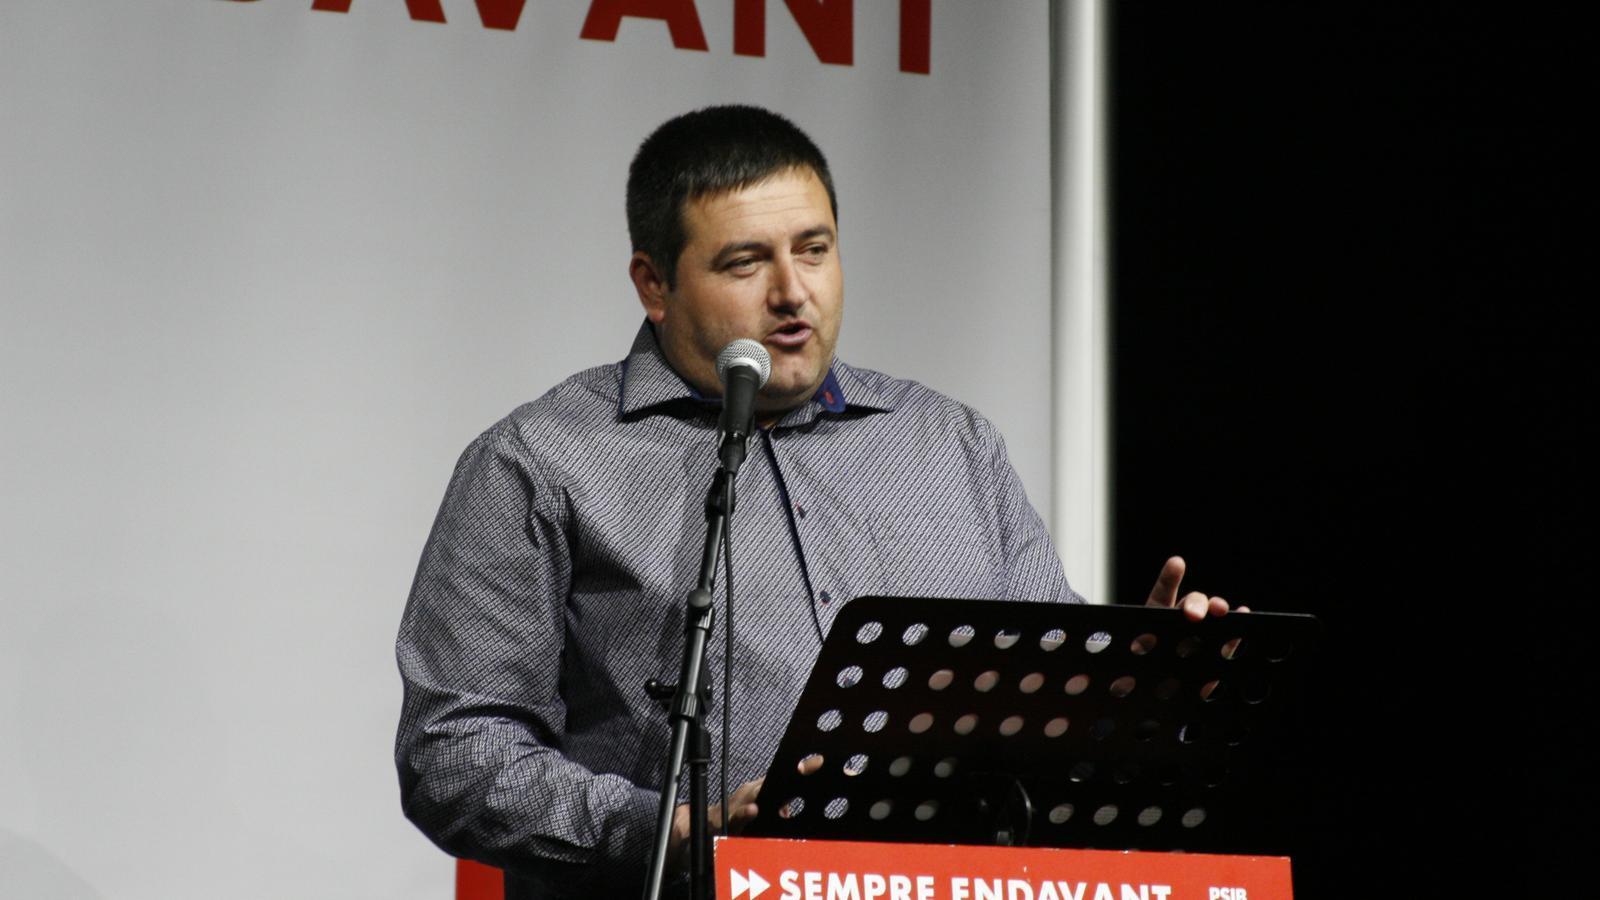 Pep Jaume, durant el míting del PSOE al poble de Sant Llorenç.